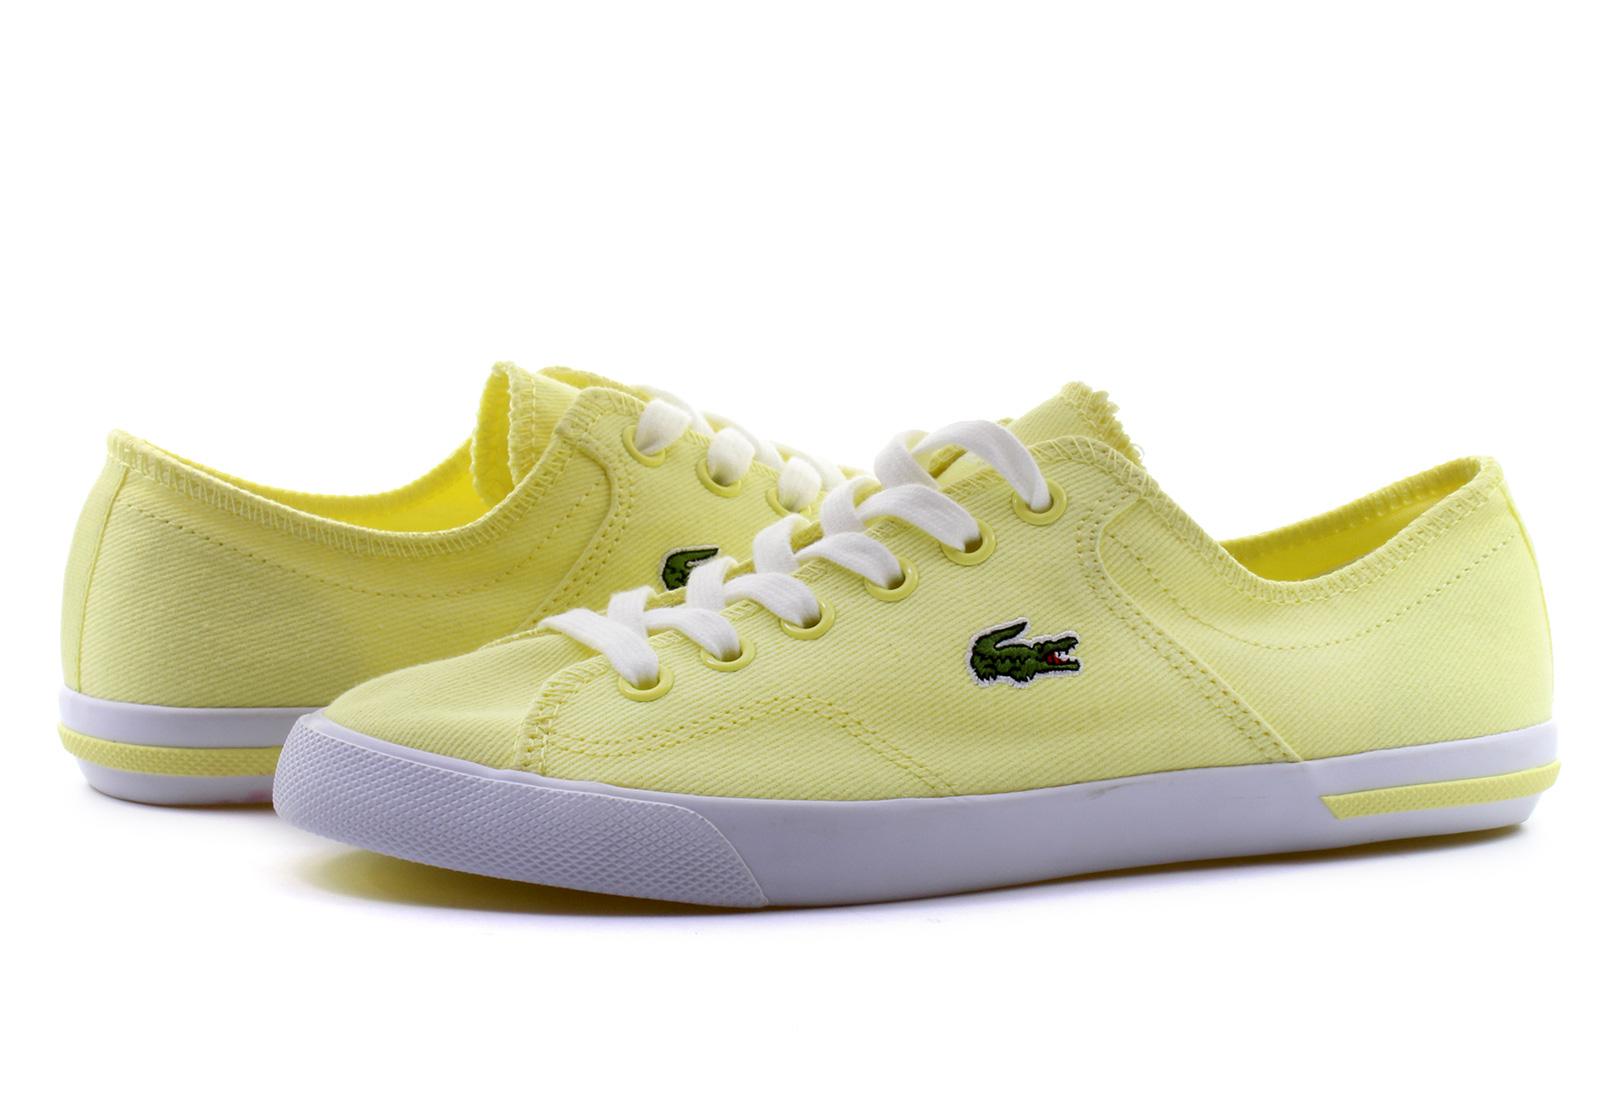 Lacoste Shoes For Women 2014 Lacoste sneakers ramer